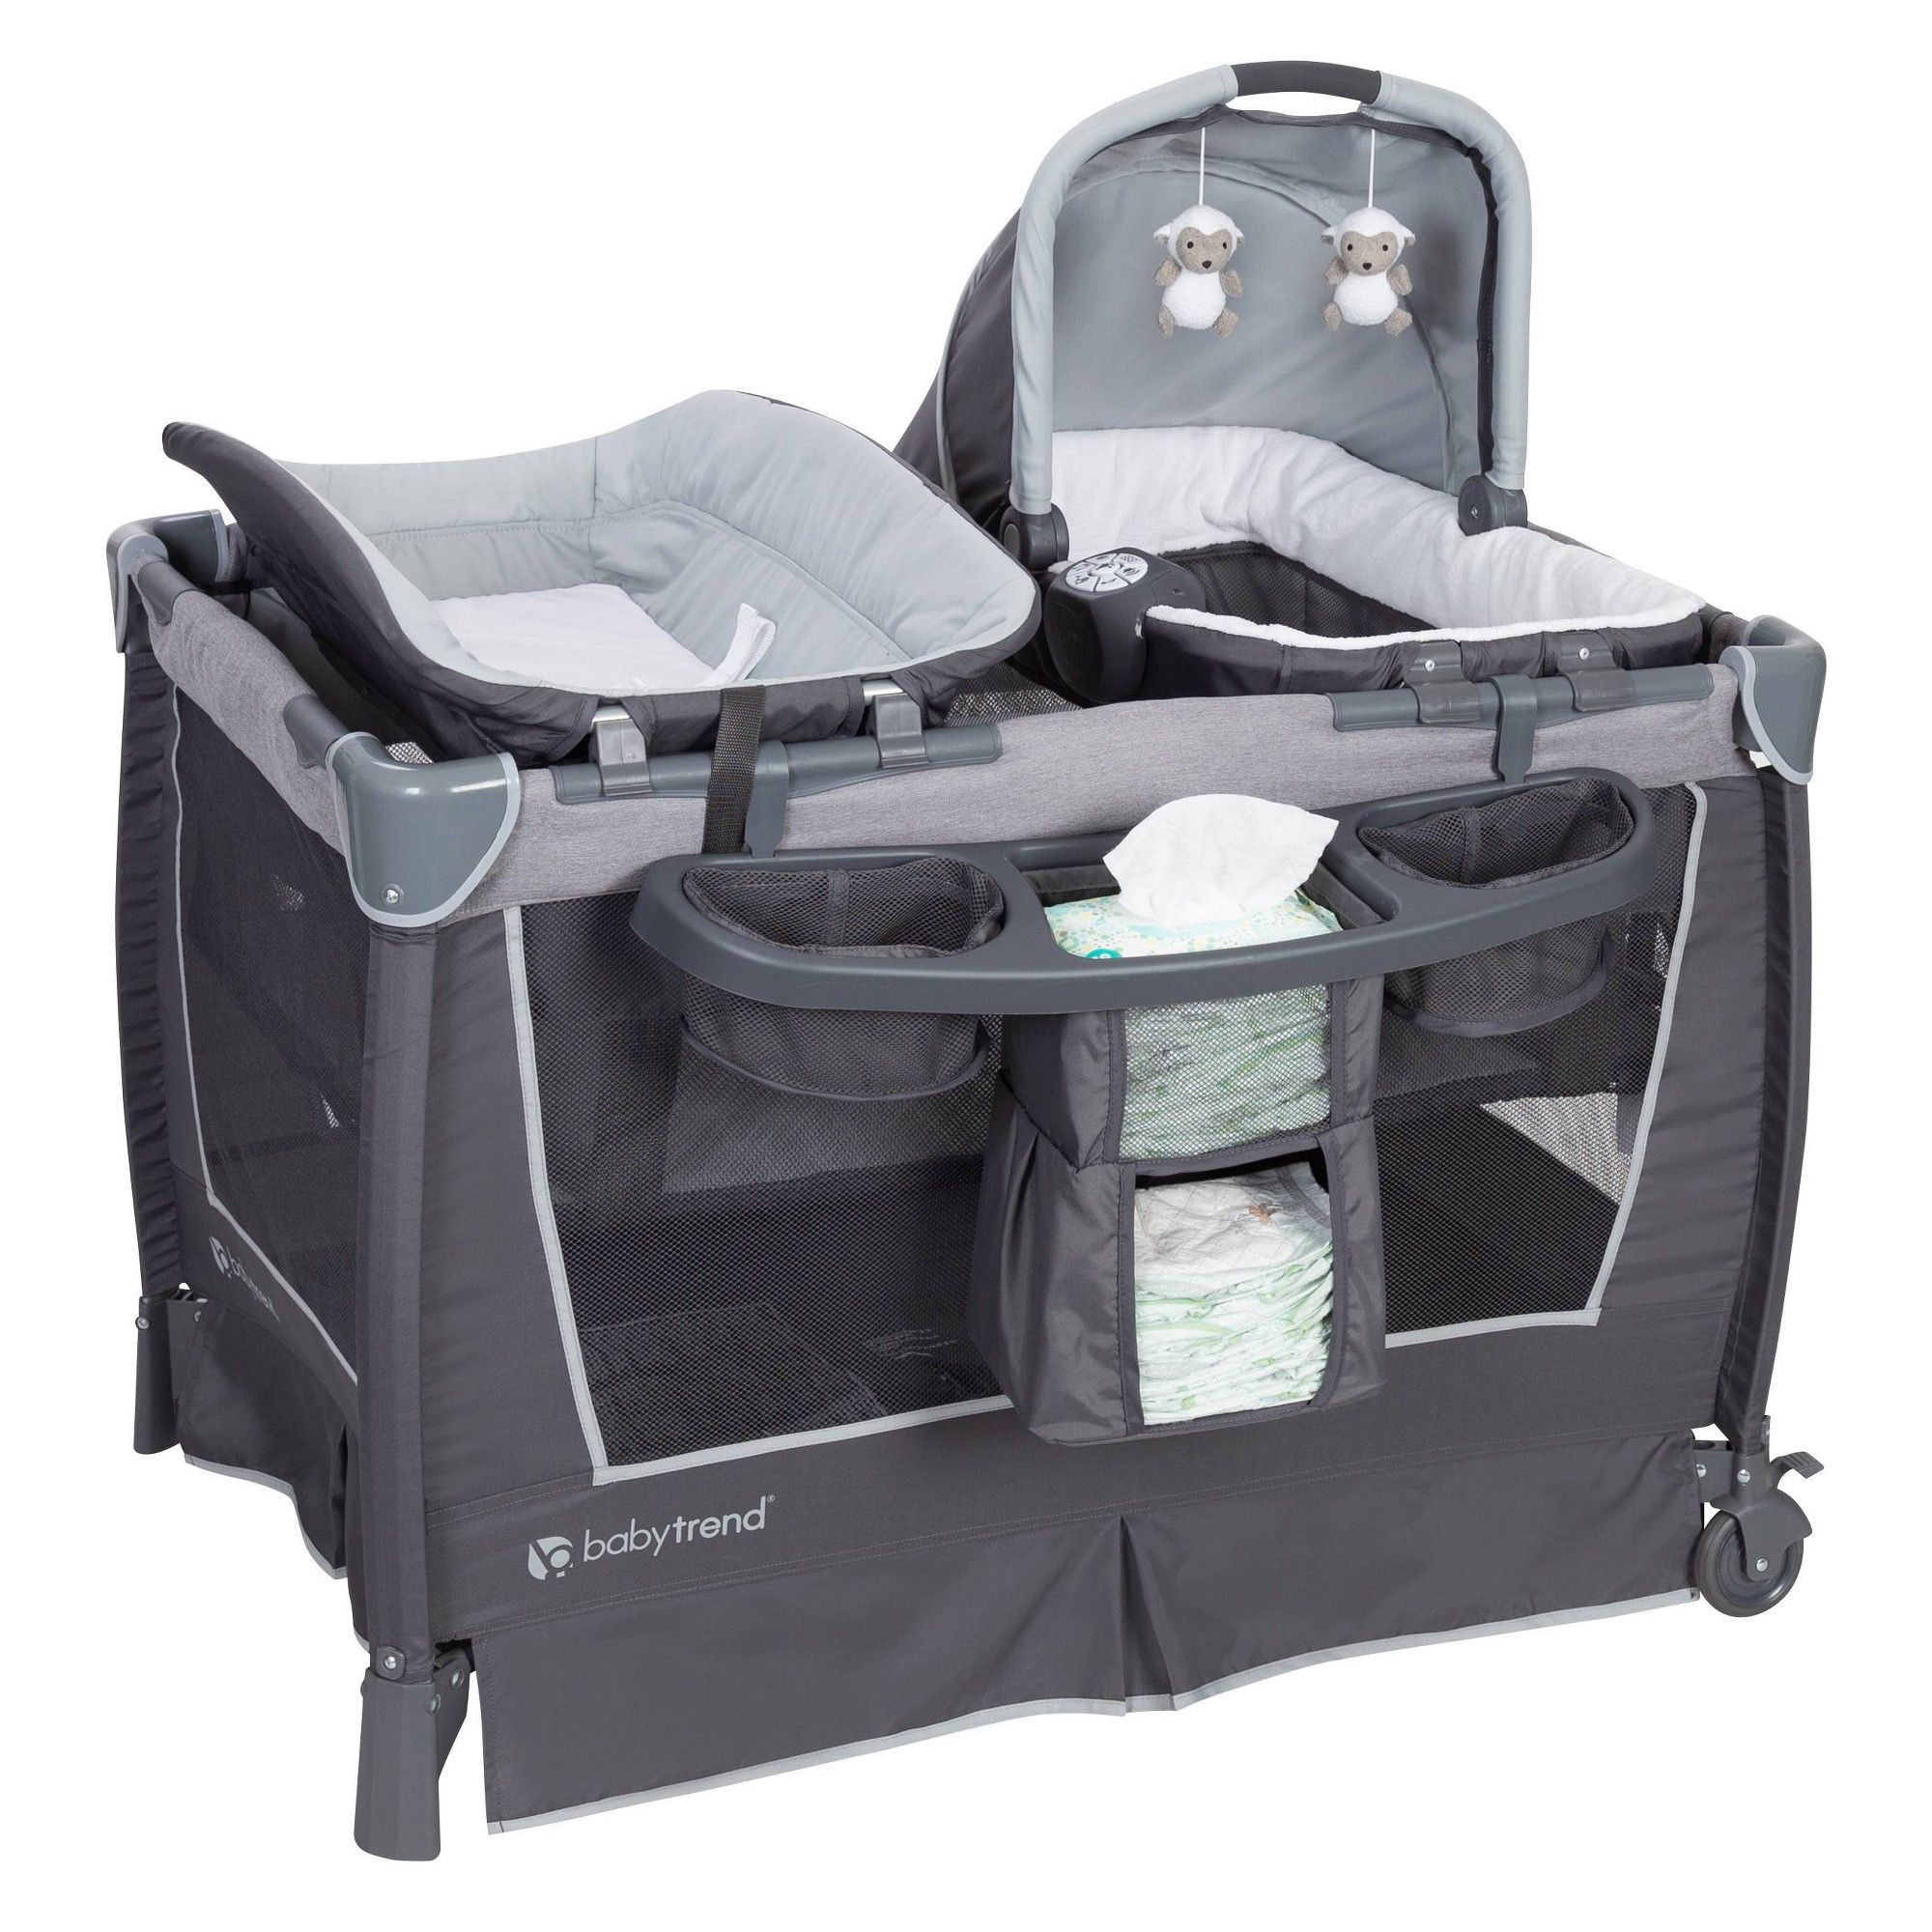 Baby Trend Retreat Nursery Center Robin Nursery twins